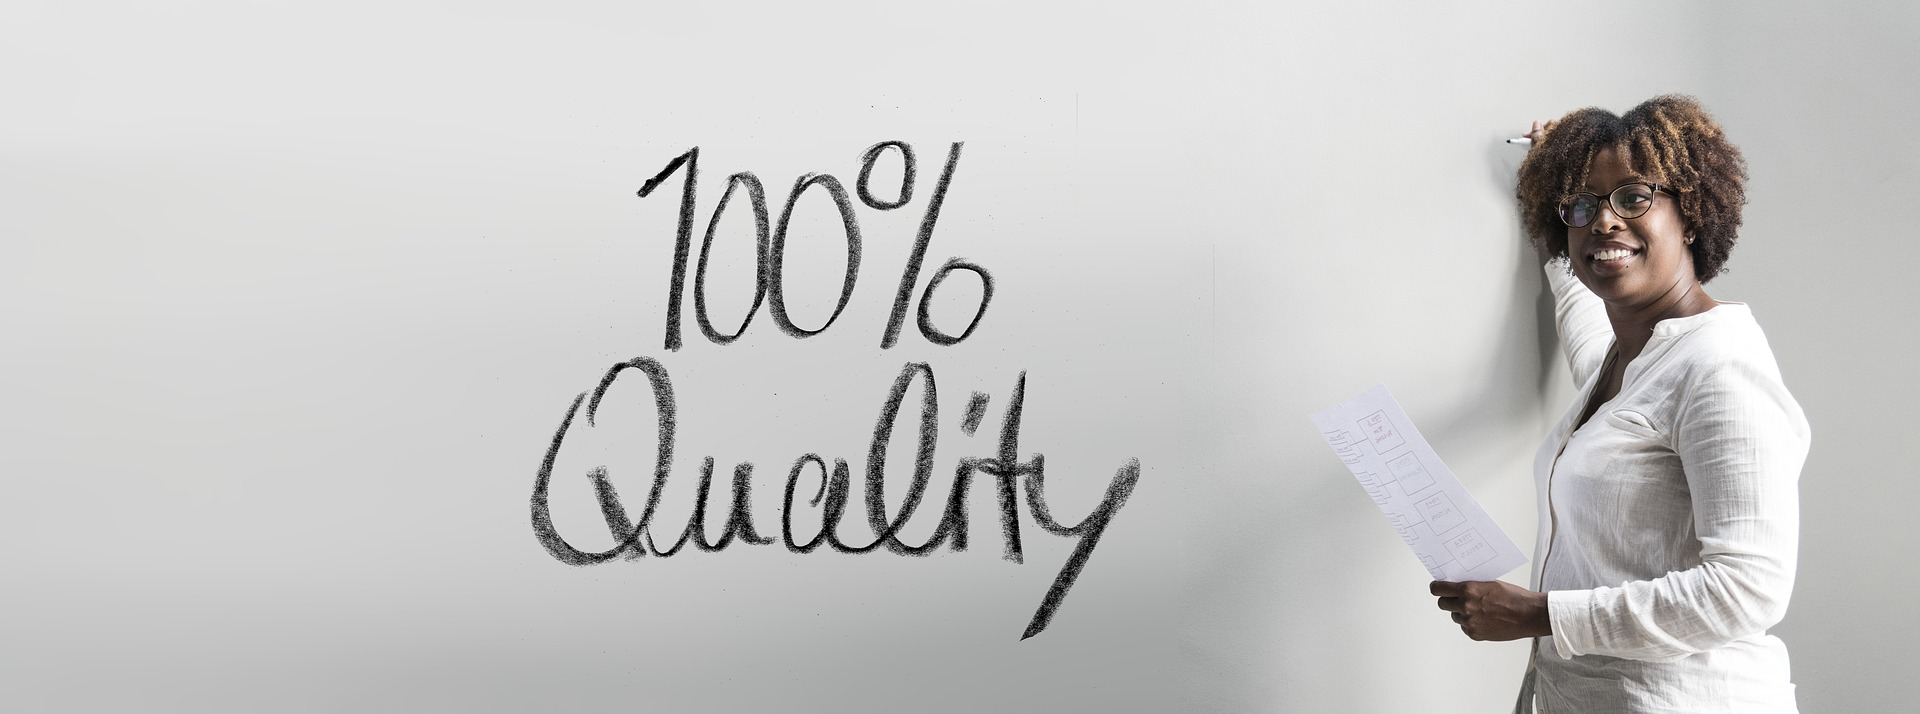 quality 3629642 1920 - ¿Cómo descubrir tu talento o don natural?